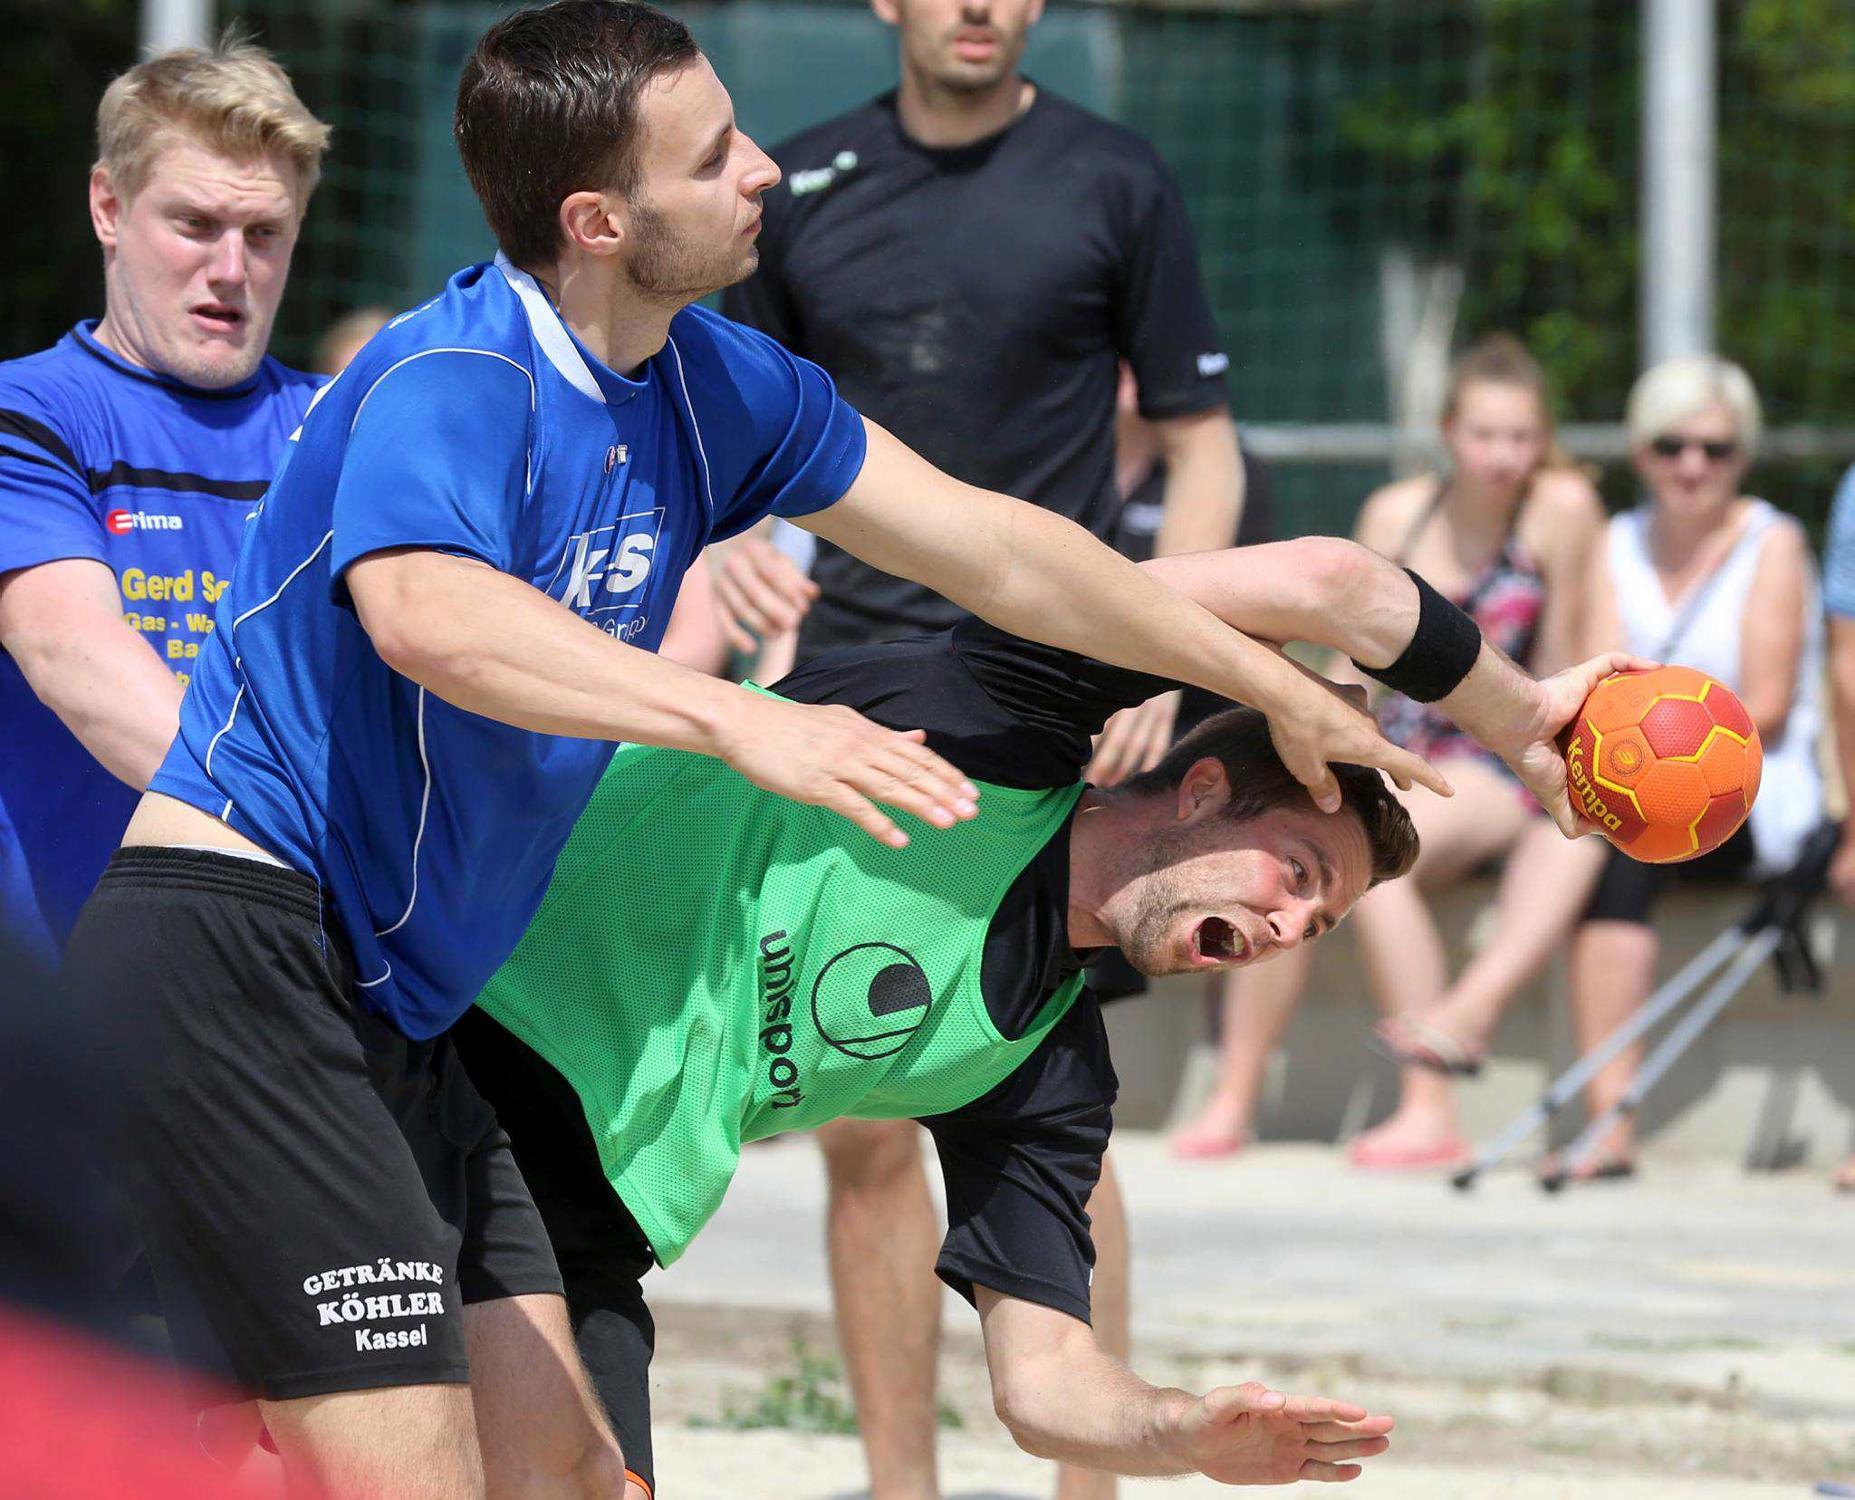 Beachhandball: Über Waldau nach Lloret de Mar | Sport Kassel